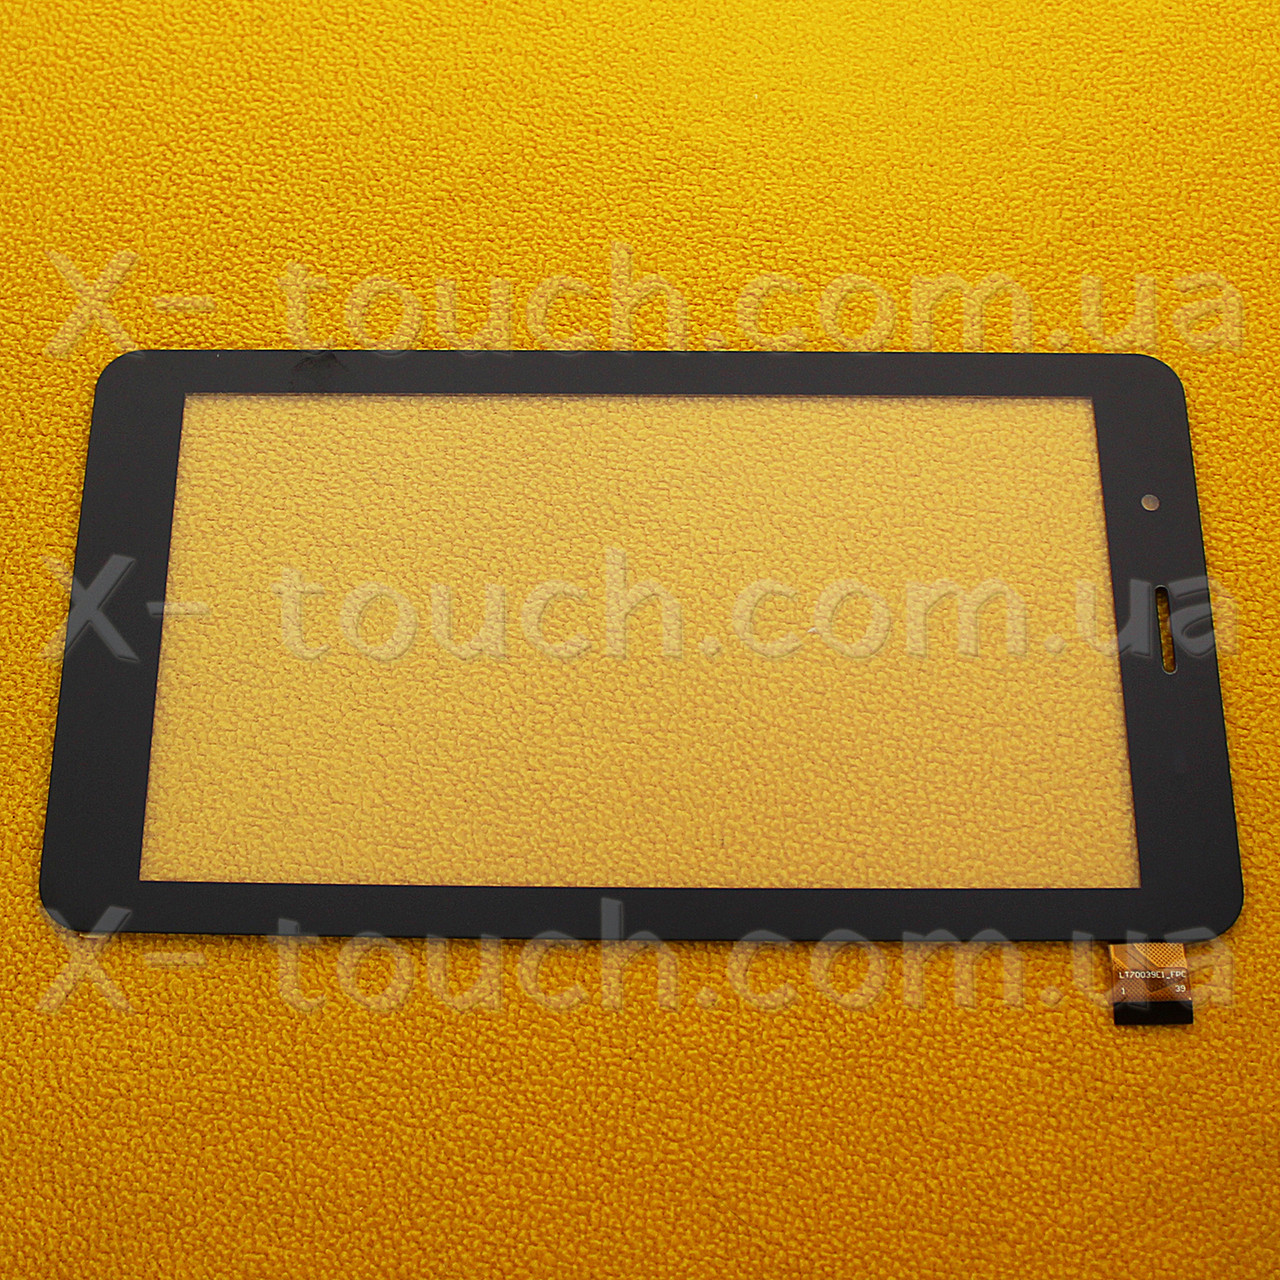 Тачскрін, сенсор LT70039E1 FPC для планшета